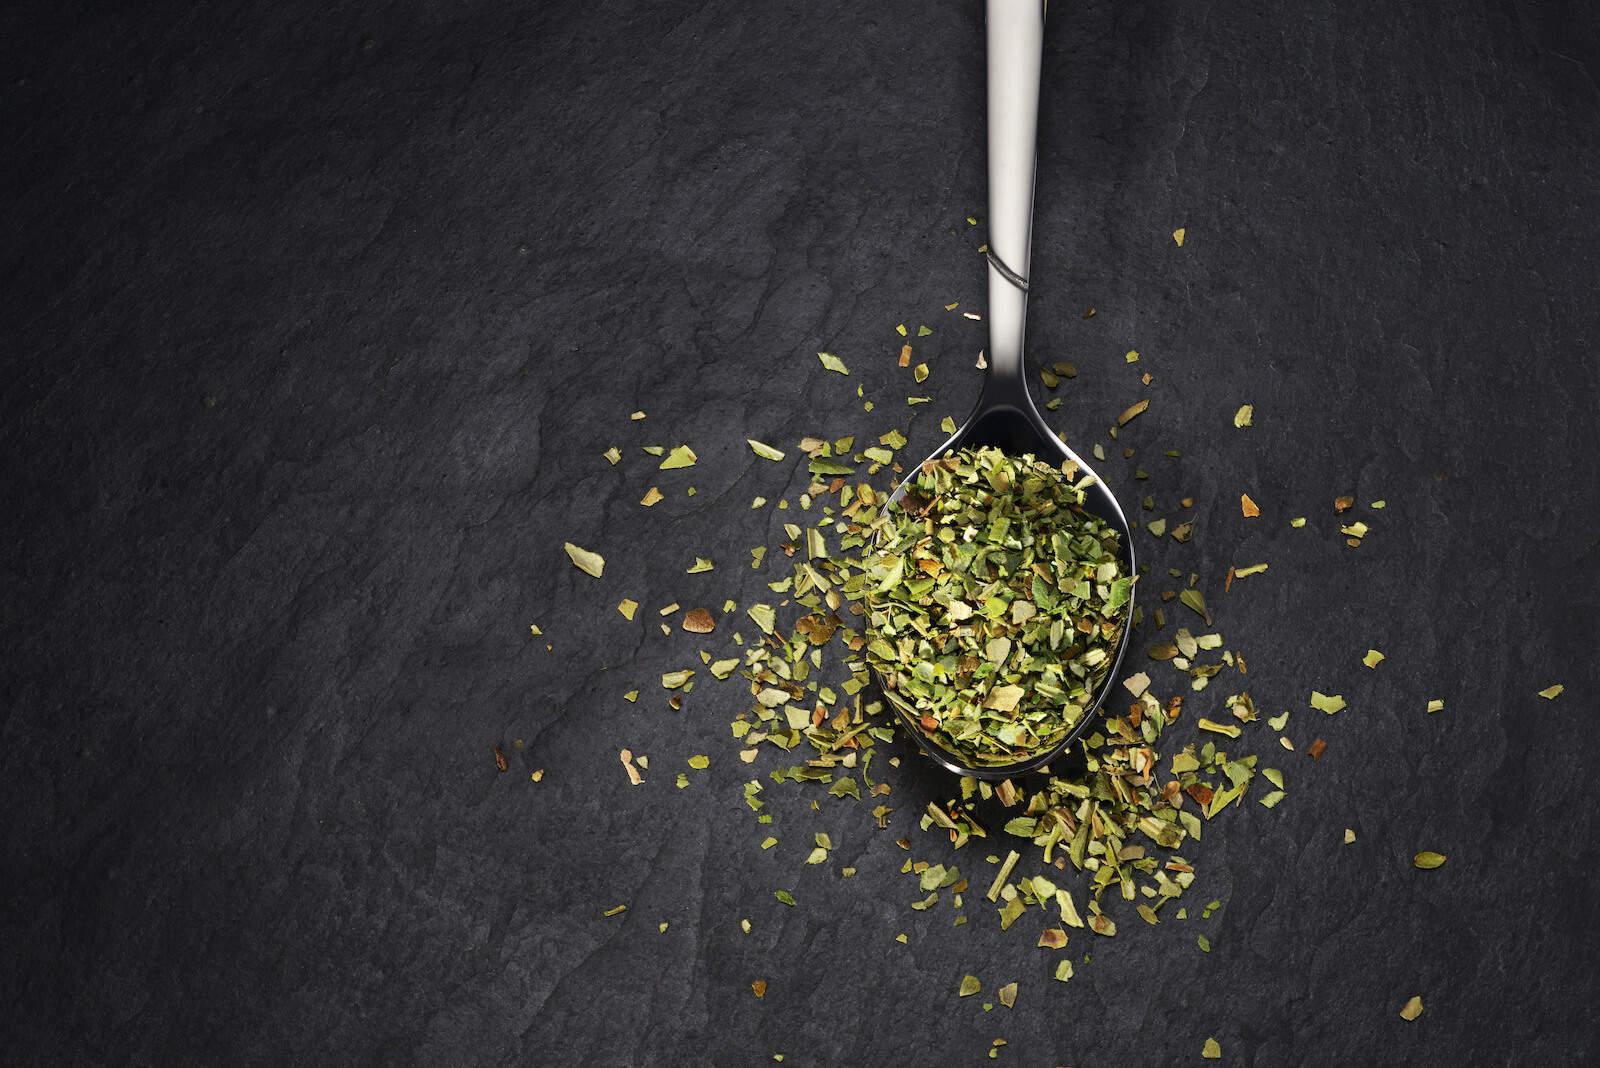 oil of oregano benefits: teaspoon with oregano spice